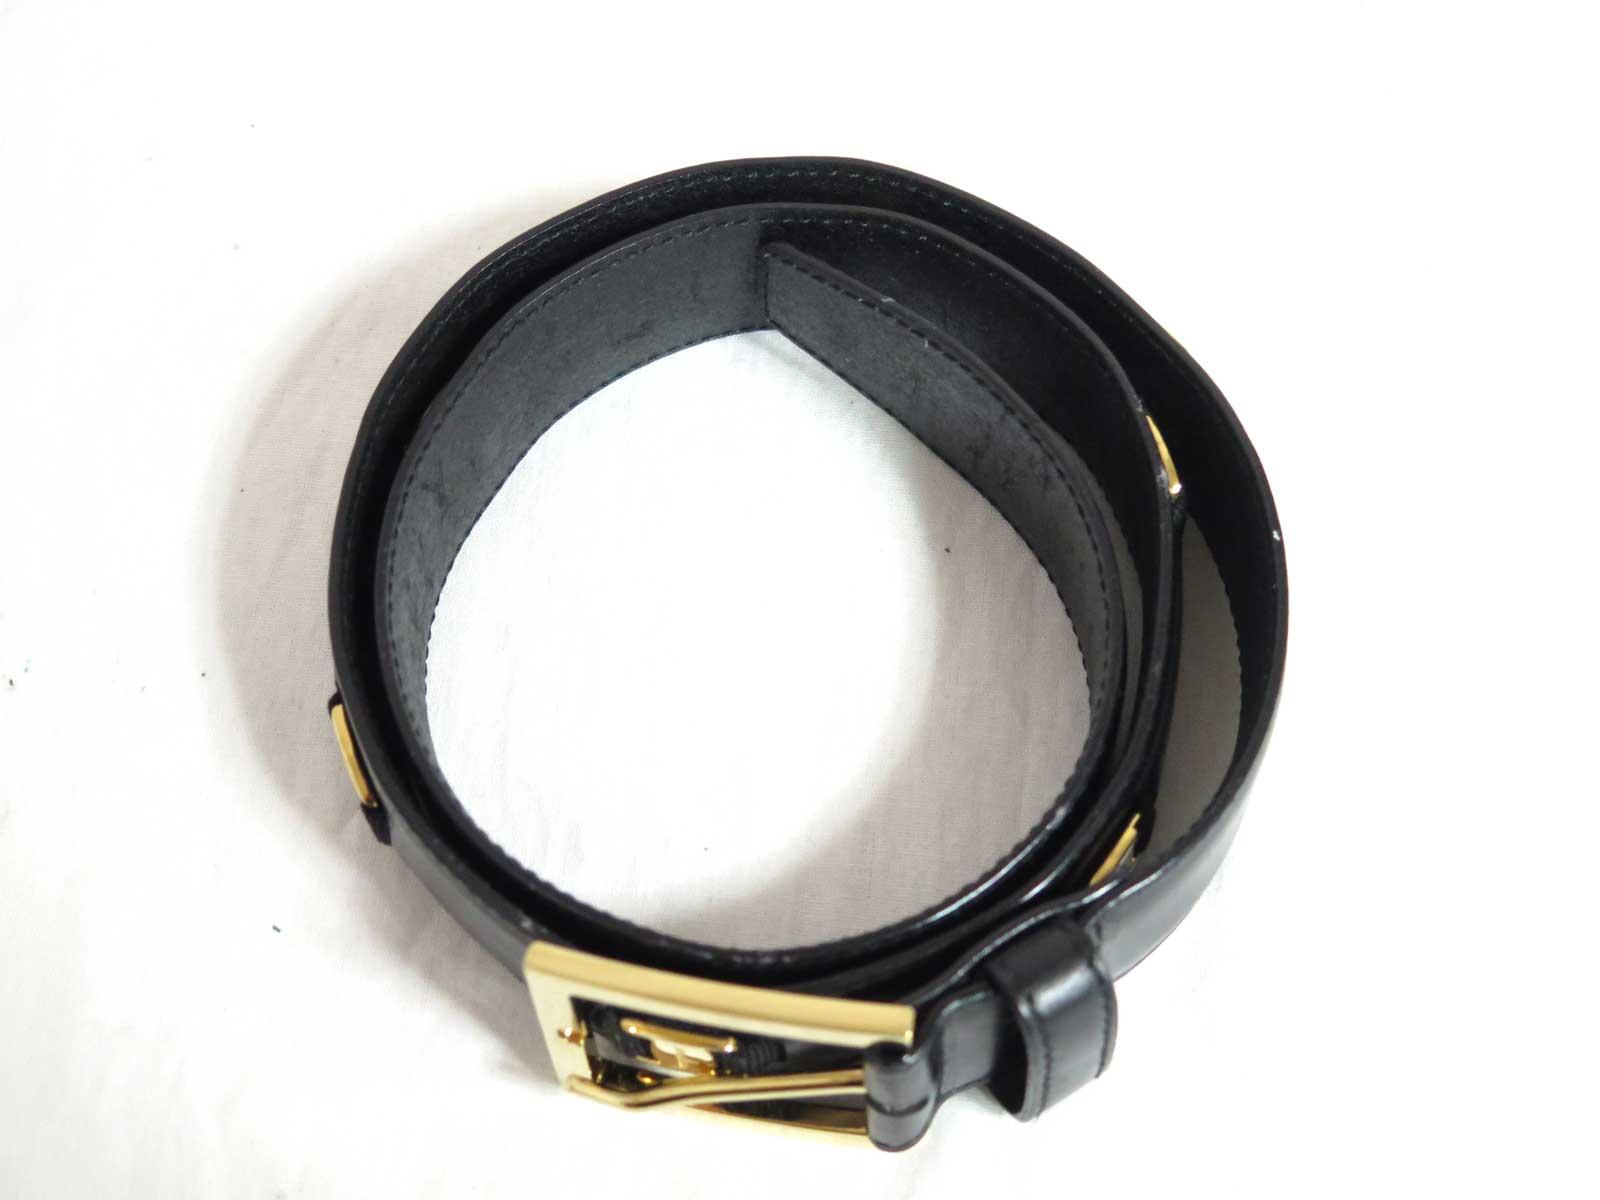 Auth Salvatore Ferragamo Vara Belt Black Leather\/Goldtone - e26970